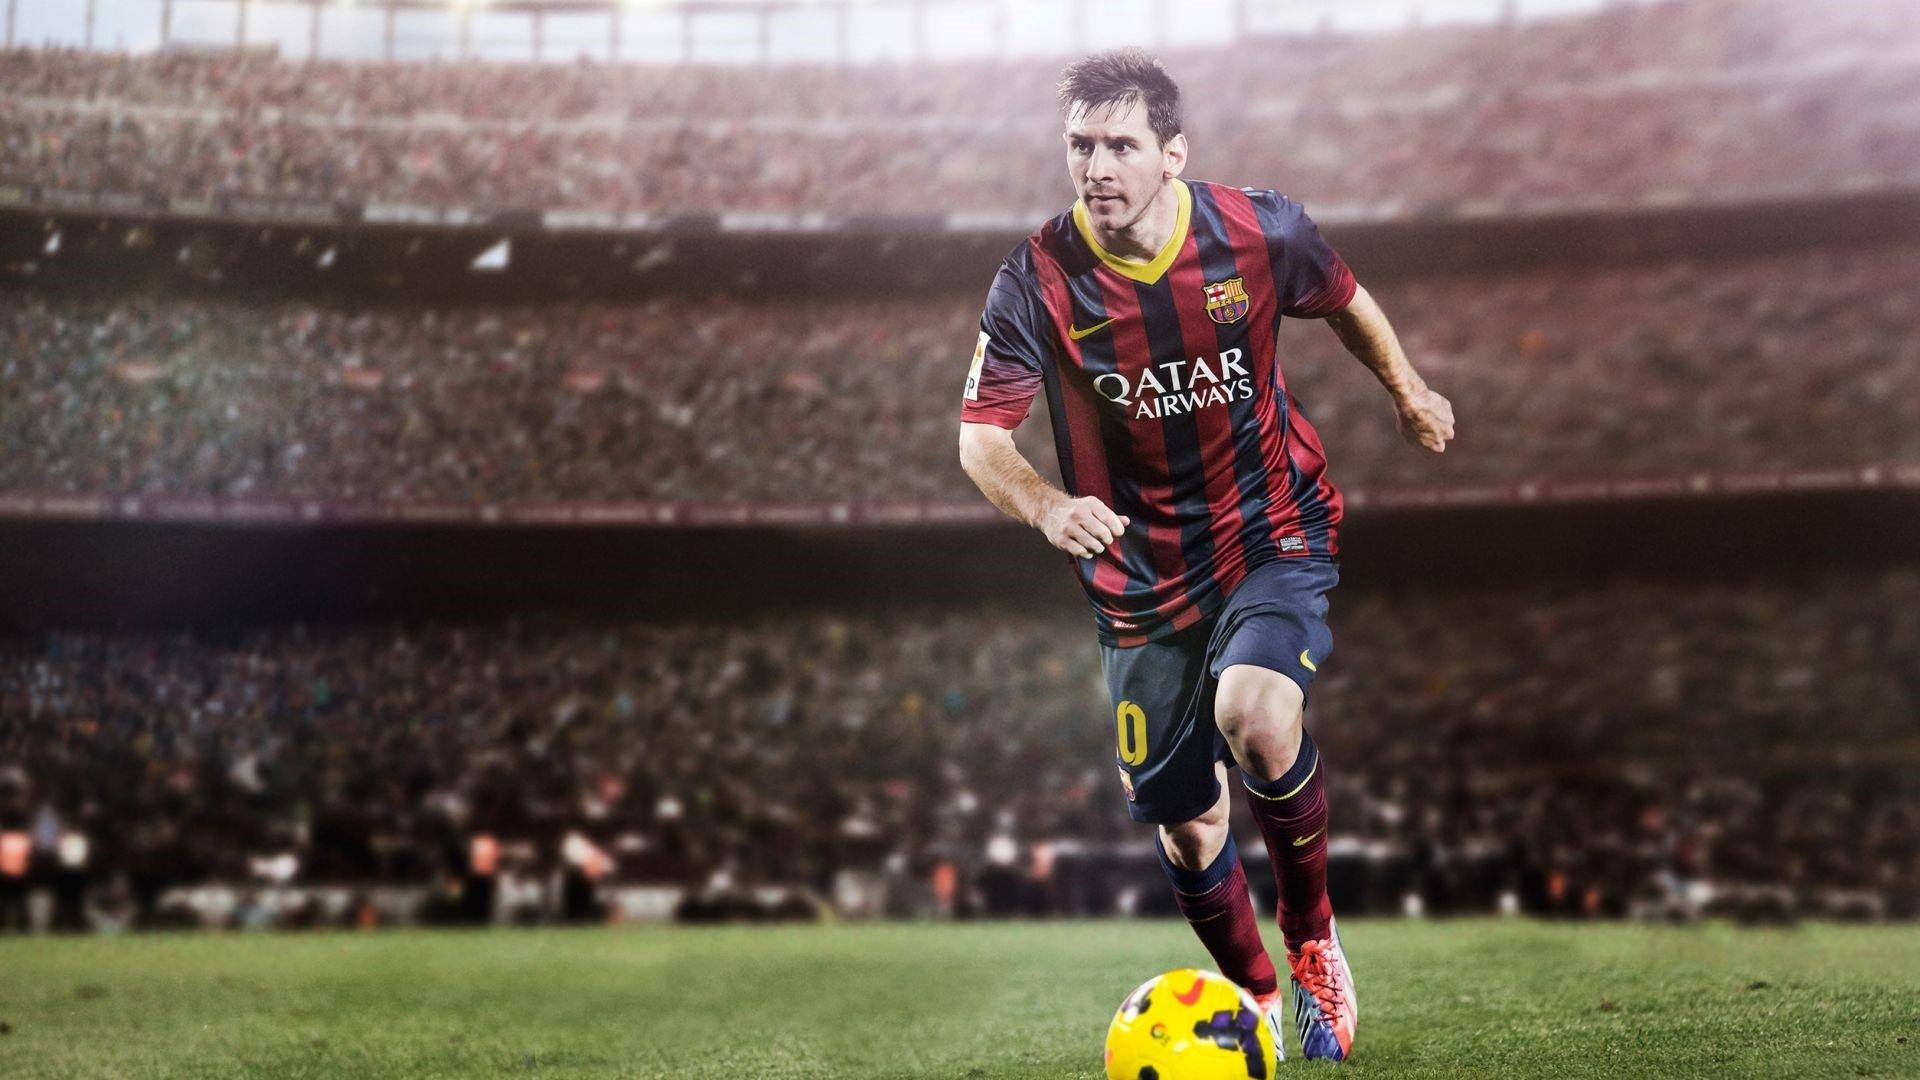 Lionel Messi Free Wallpaper